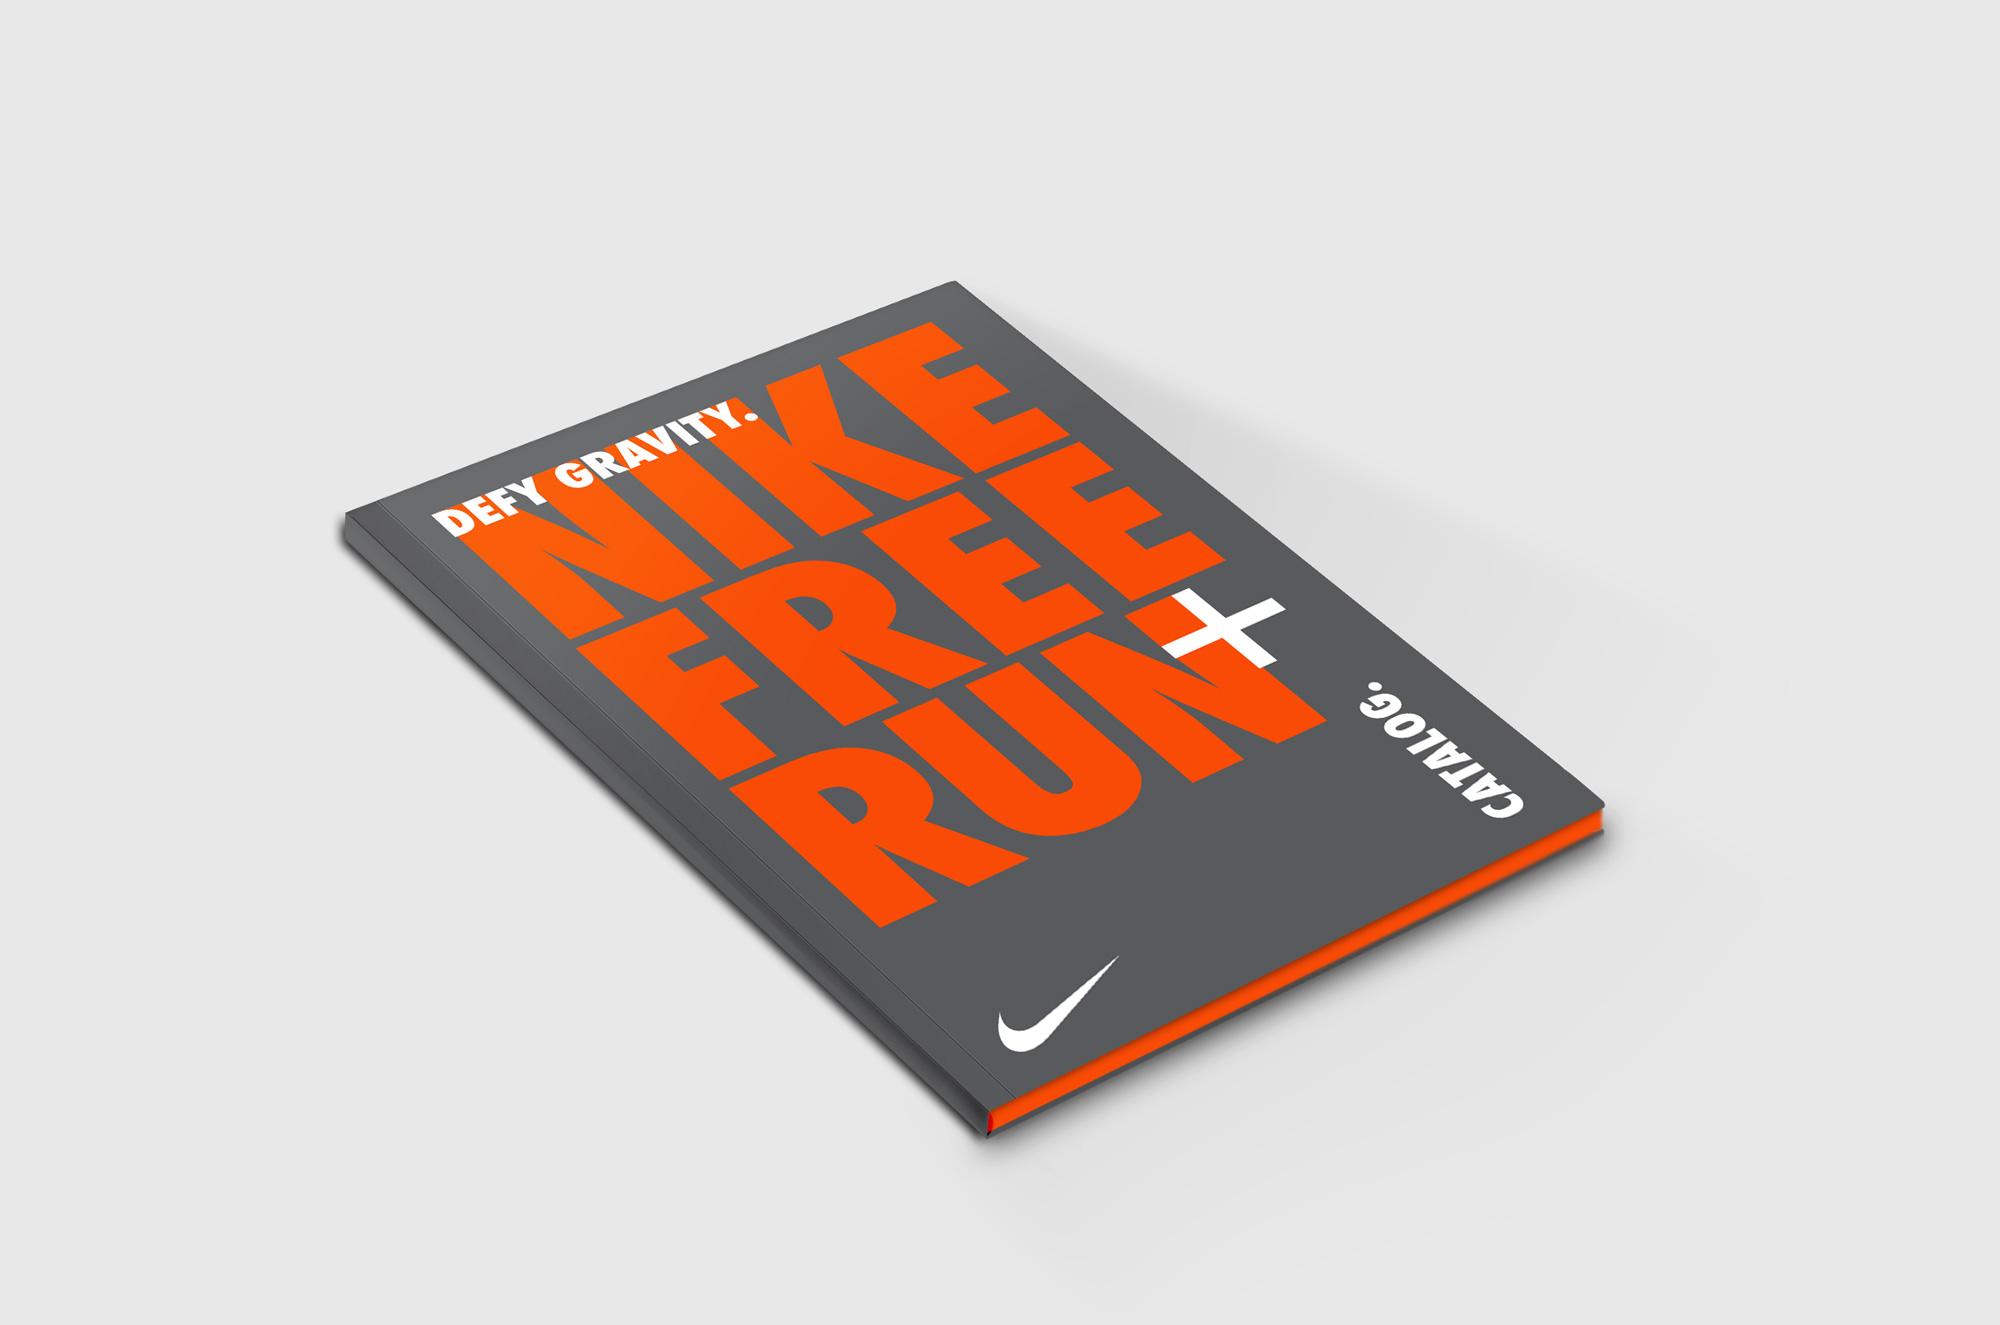 Nike-Free-Ride-catalog-cover.jpg